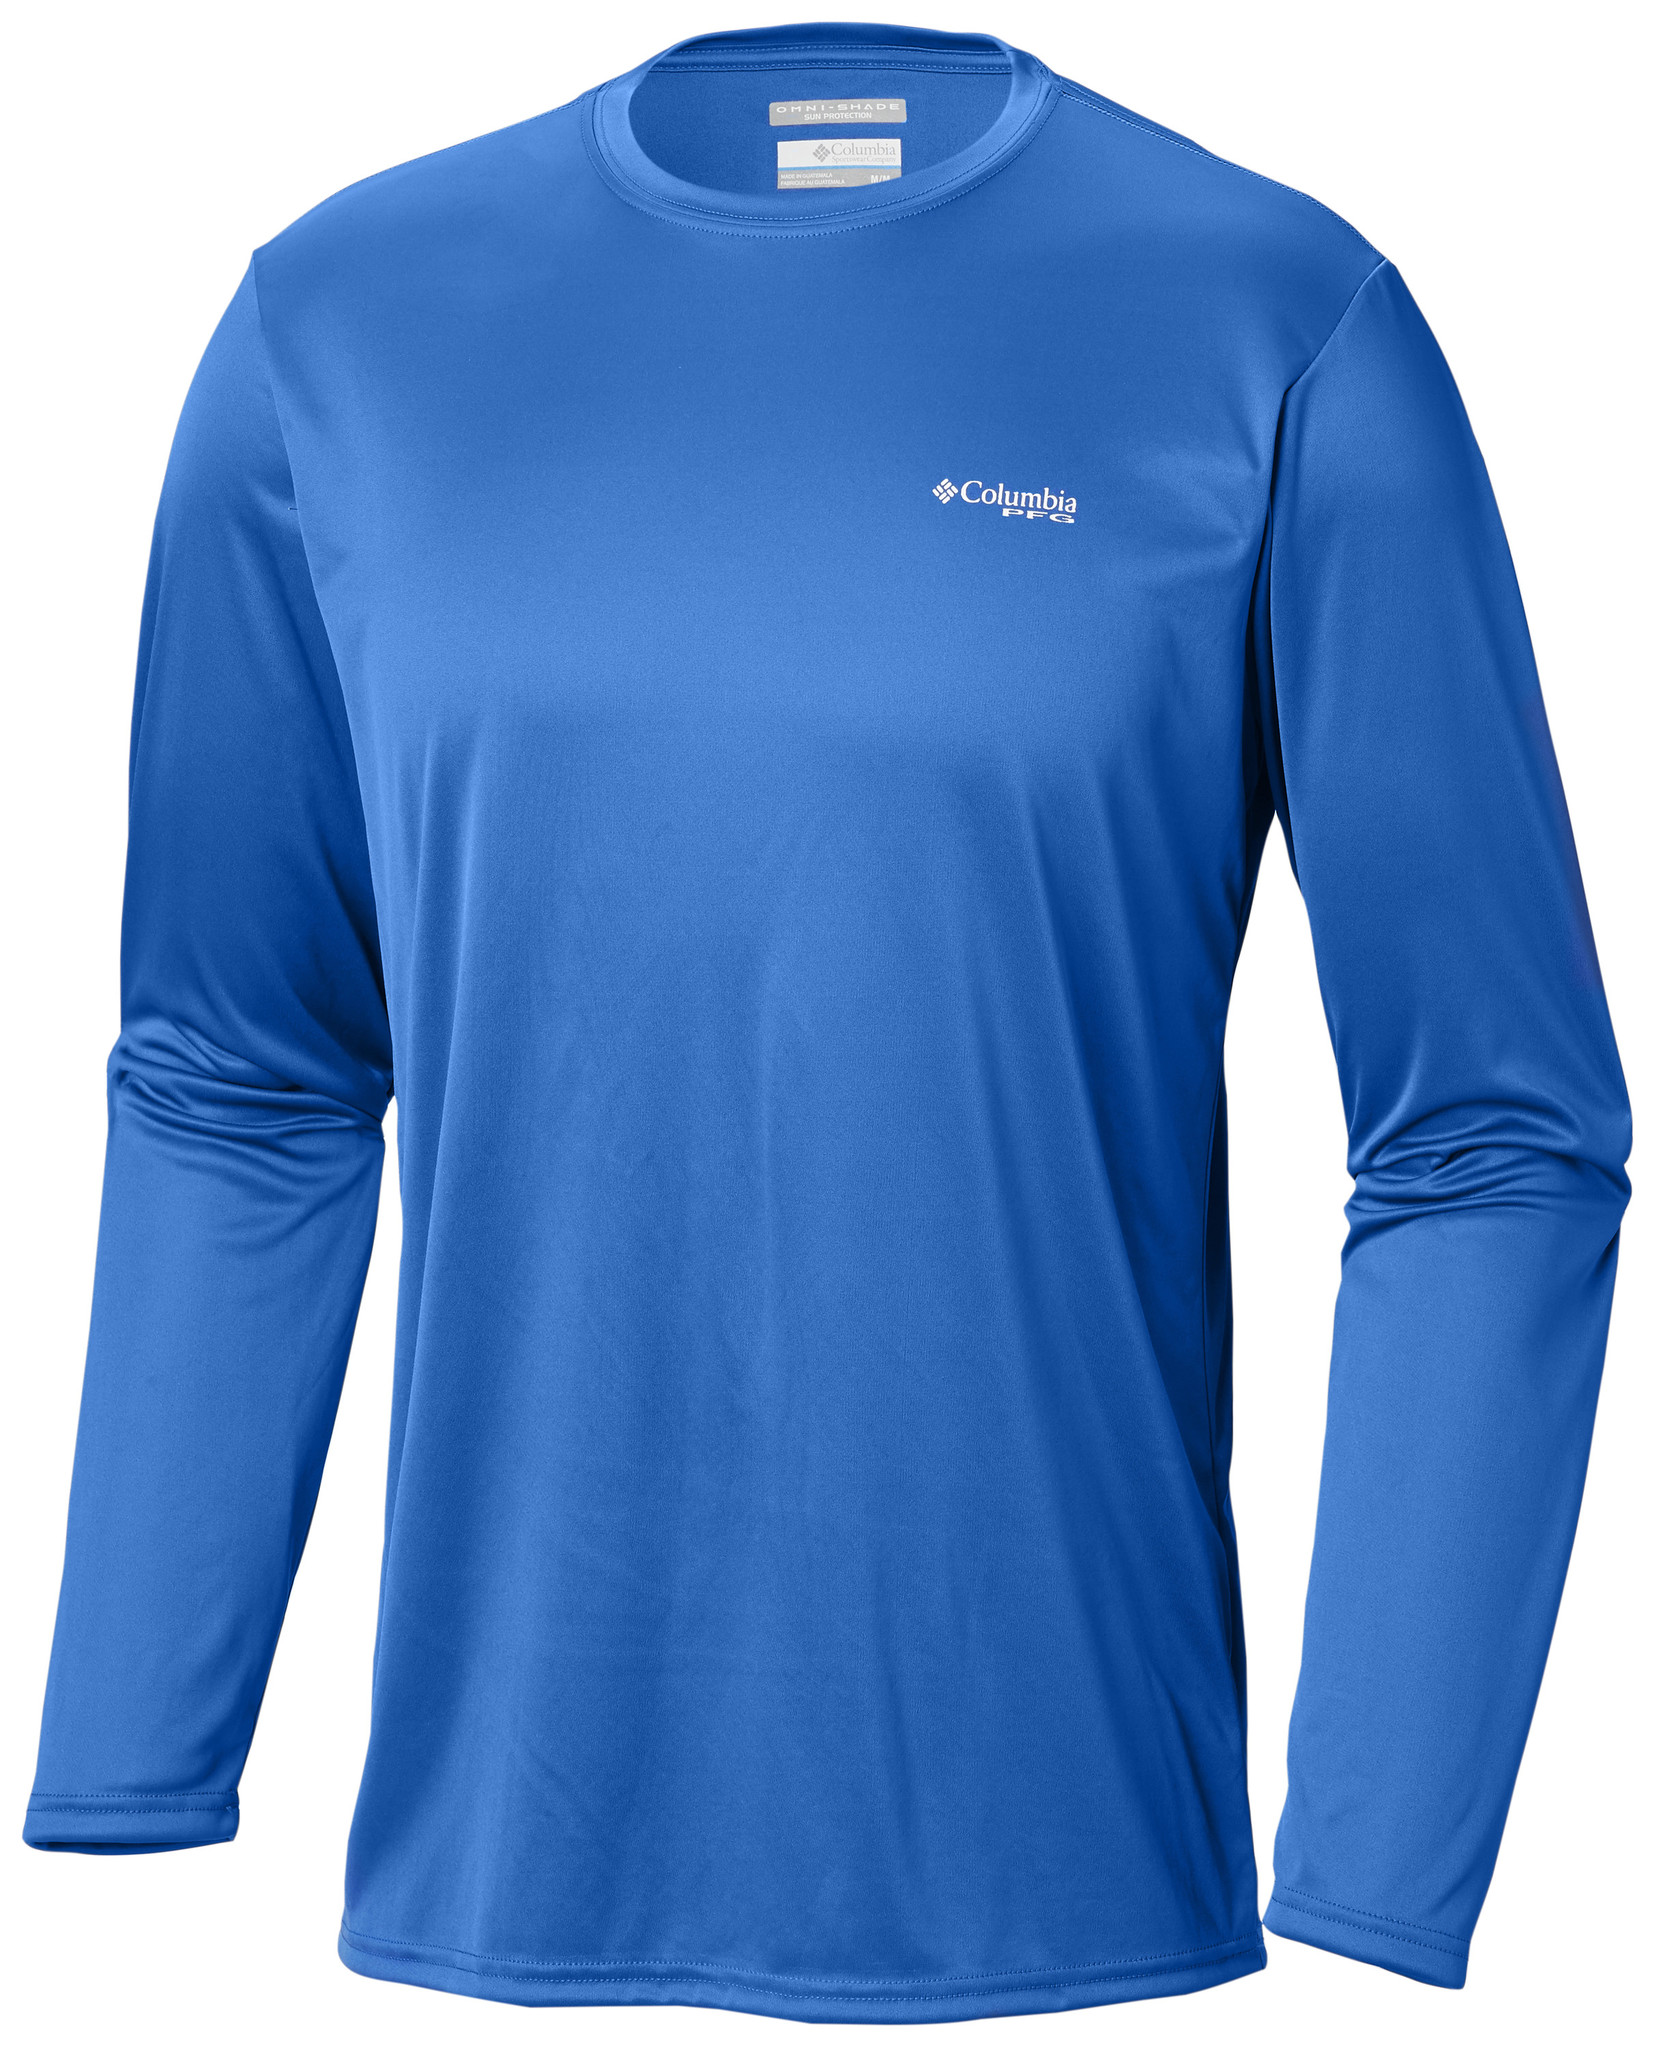 c9842872 ... Columbia Sportwear Men's Terminal Tackle PFG Triangle Flag™ Long Sleeve  Shirt—Tall ...